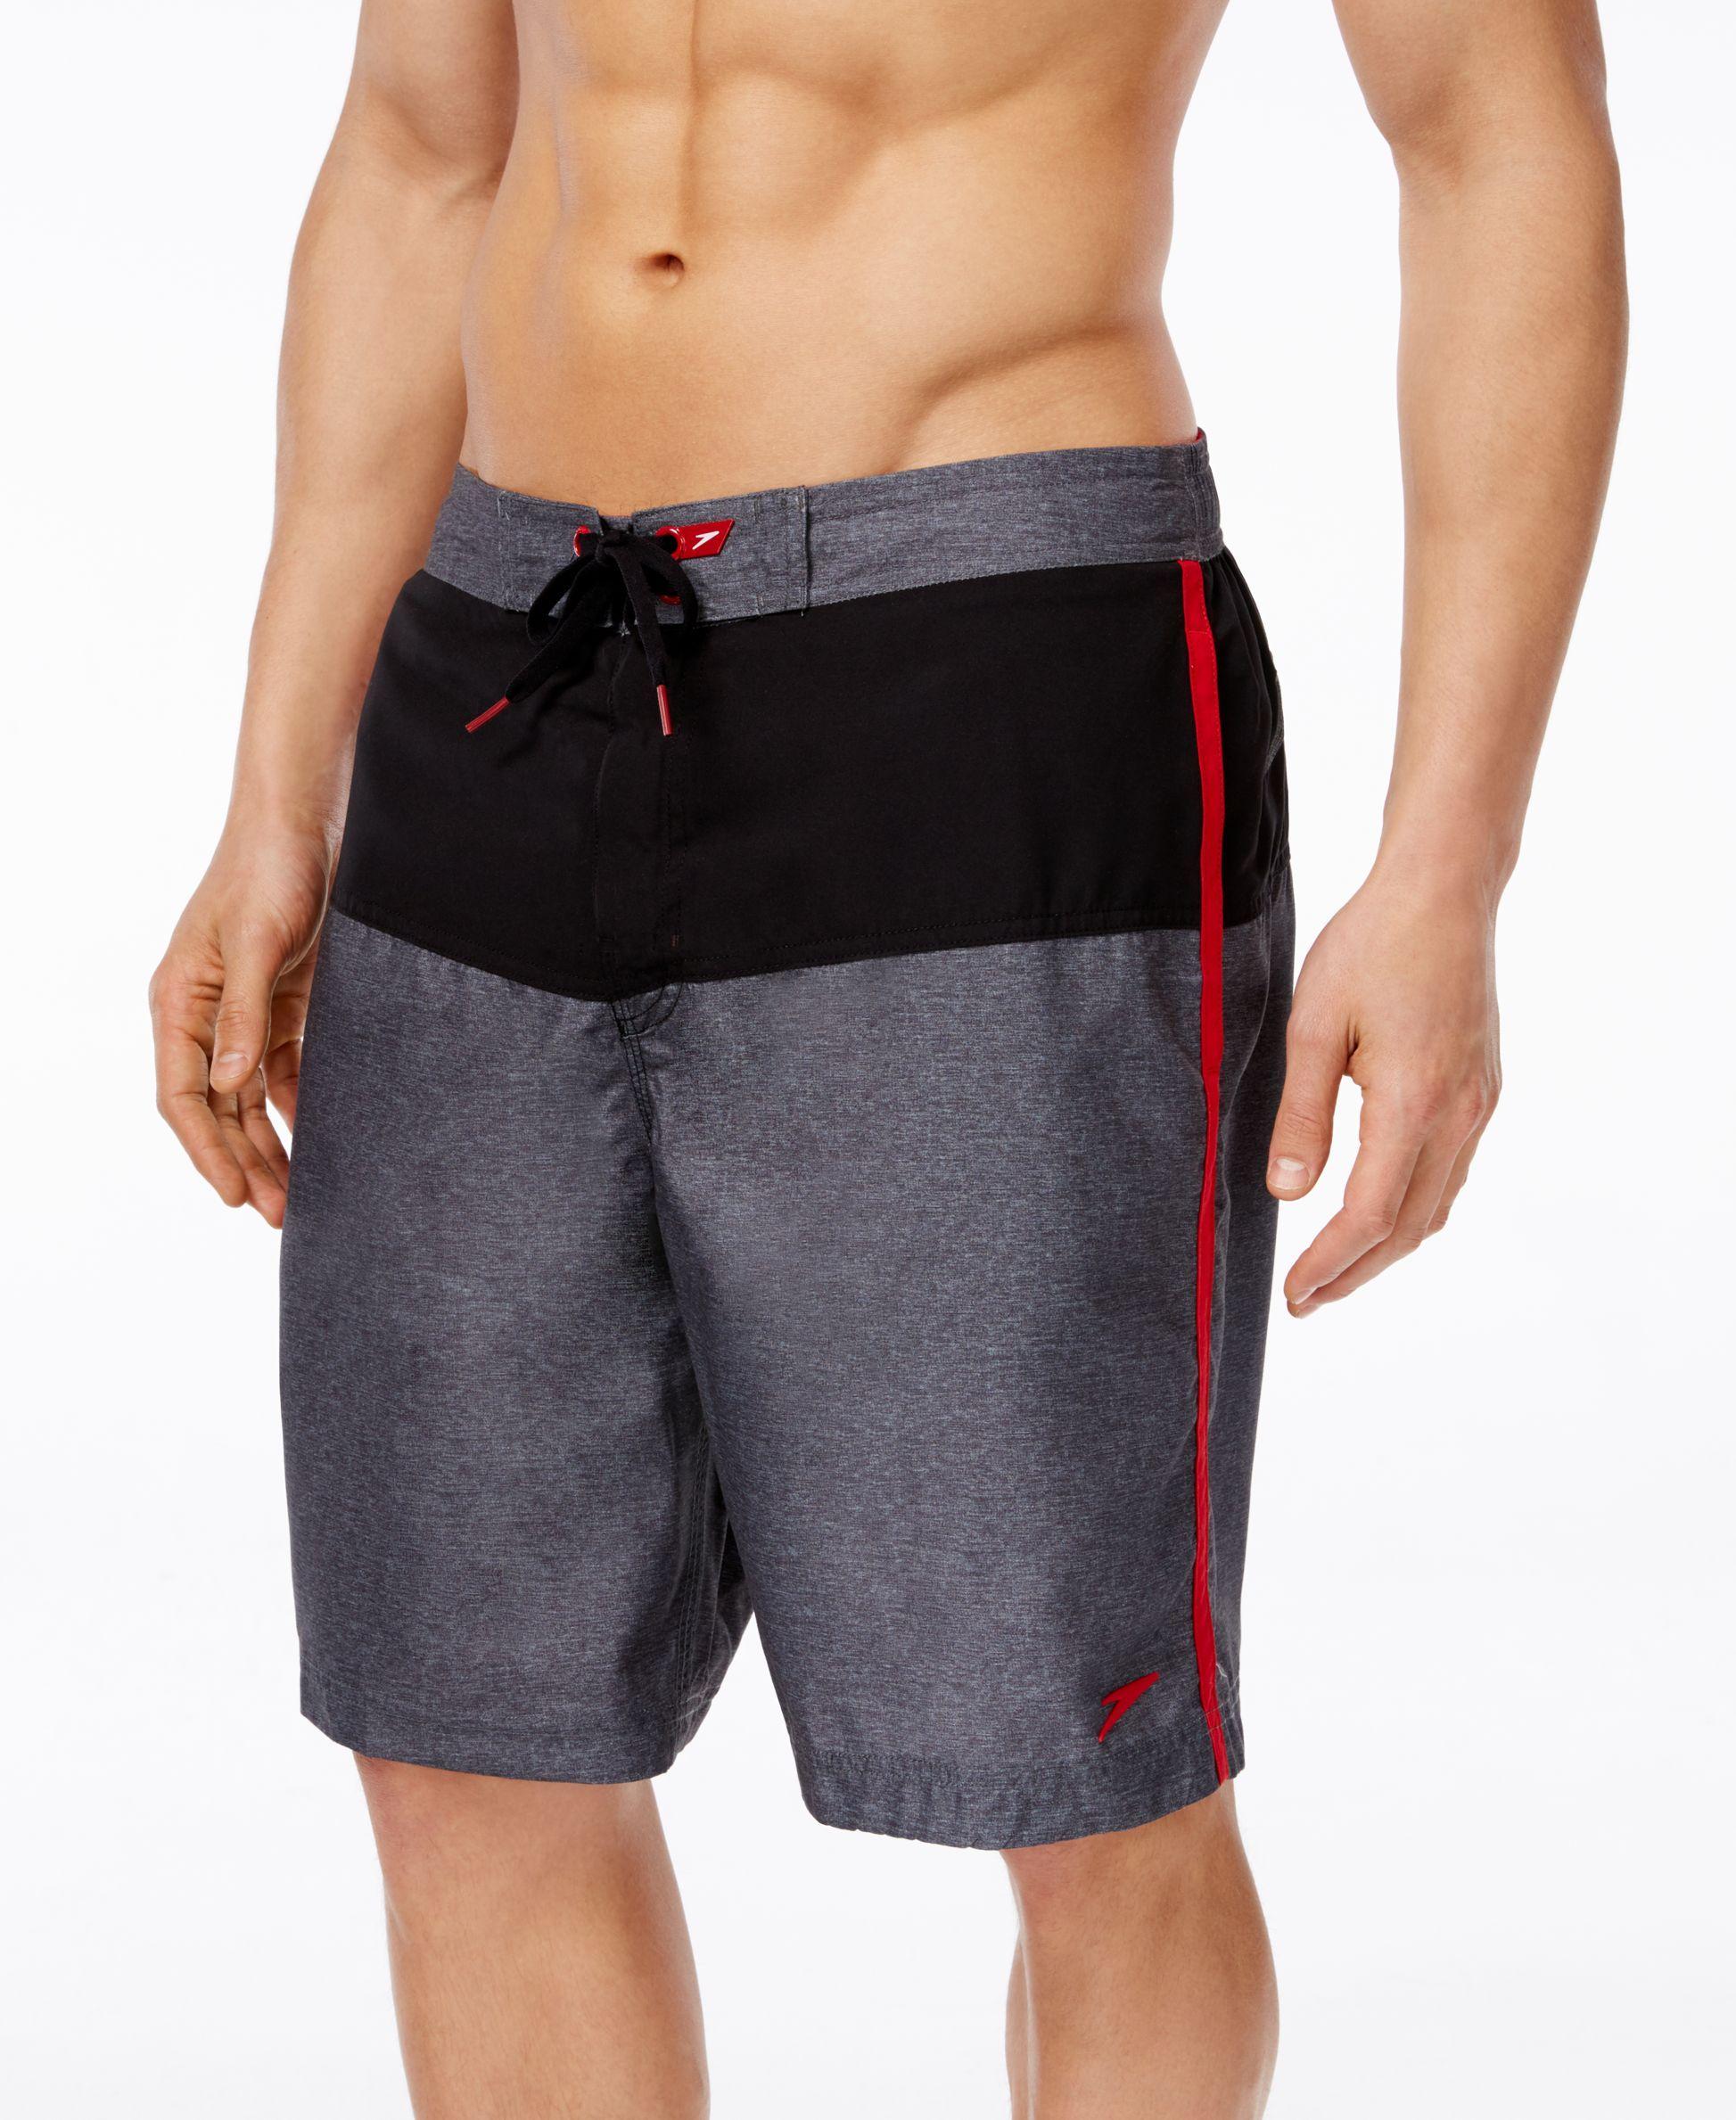 35c686d393 Speedo Long Bay E-Board Shorts   clothes   Swim trunks, Swimwear, Trunks